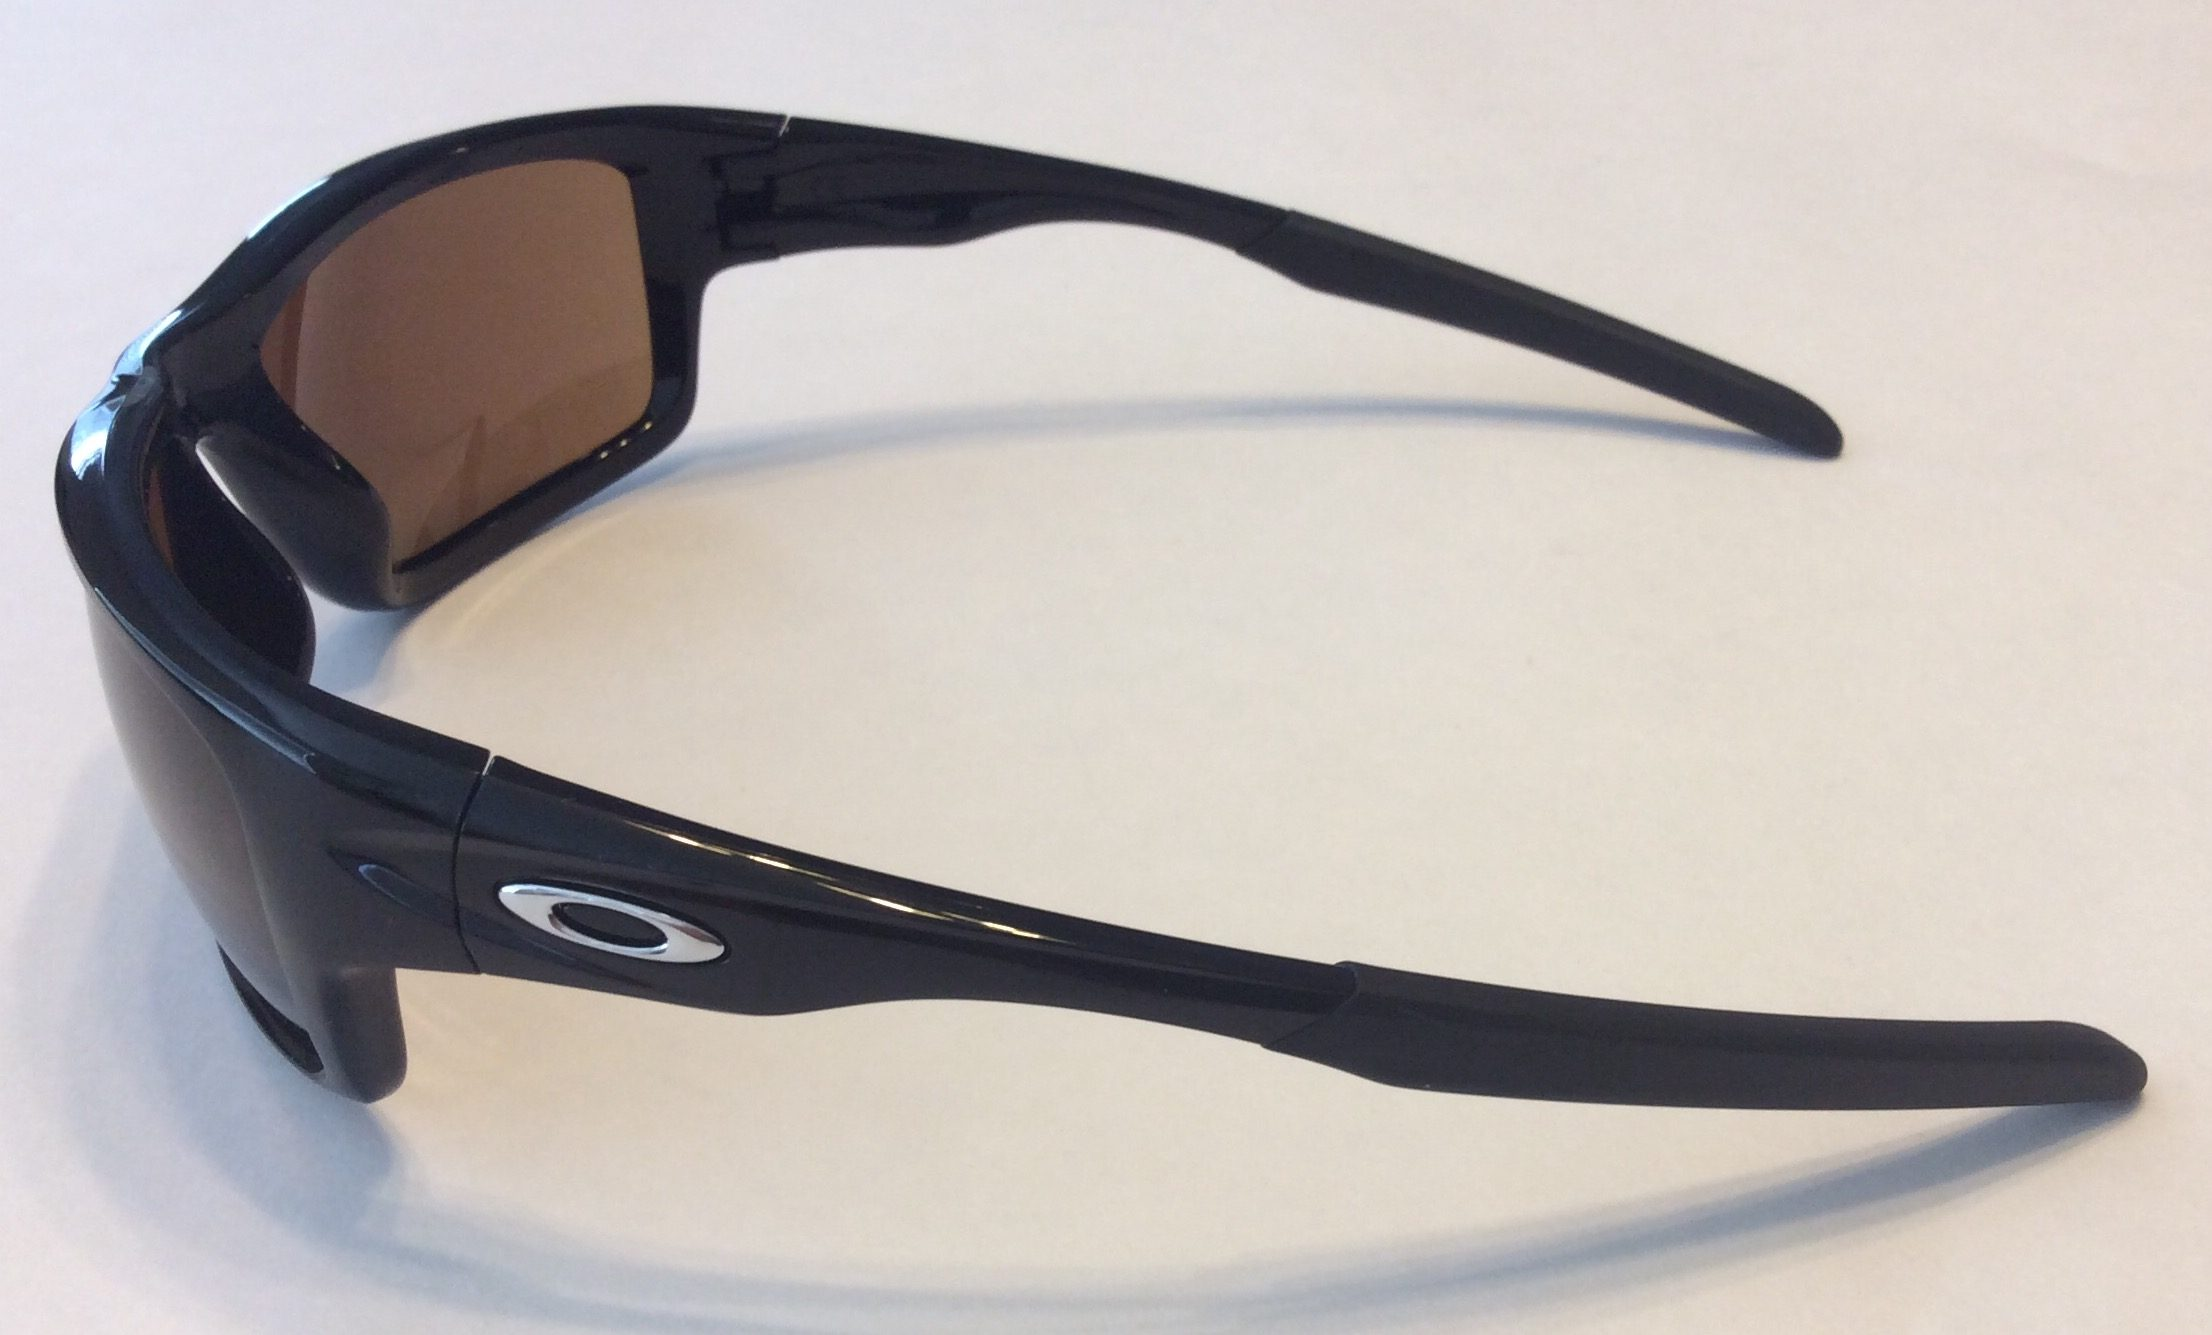 8124b81950d Oakley Canteen Sunglasses - Polished Black - Dark Bronze OO9225-12